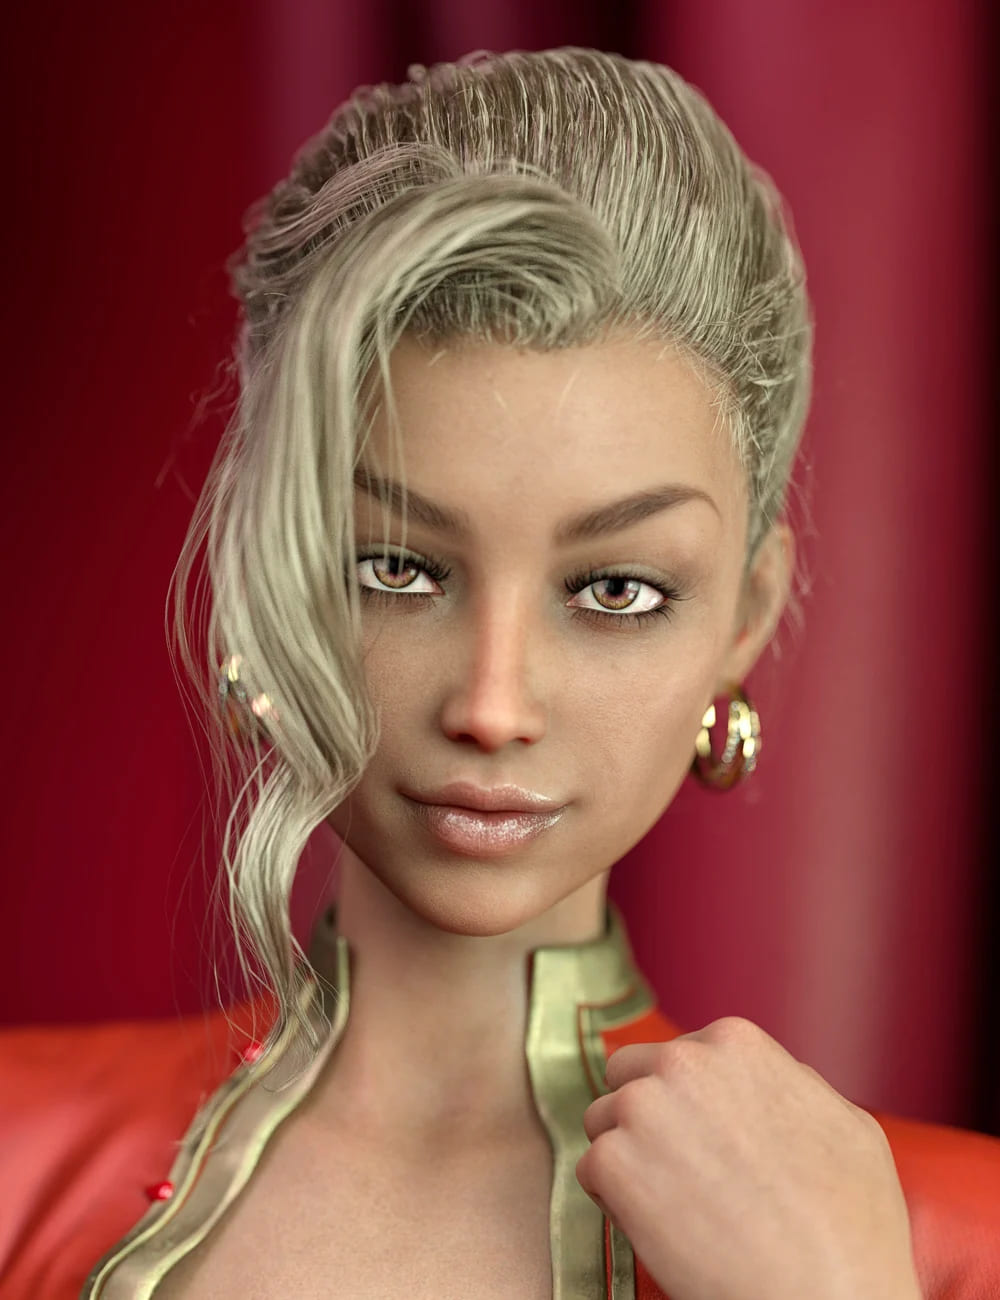 MR Luryana for Genesis 8 Female_DAZ3D下载站